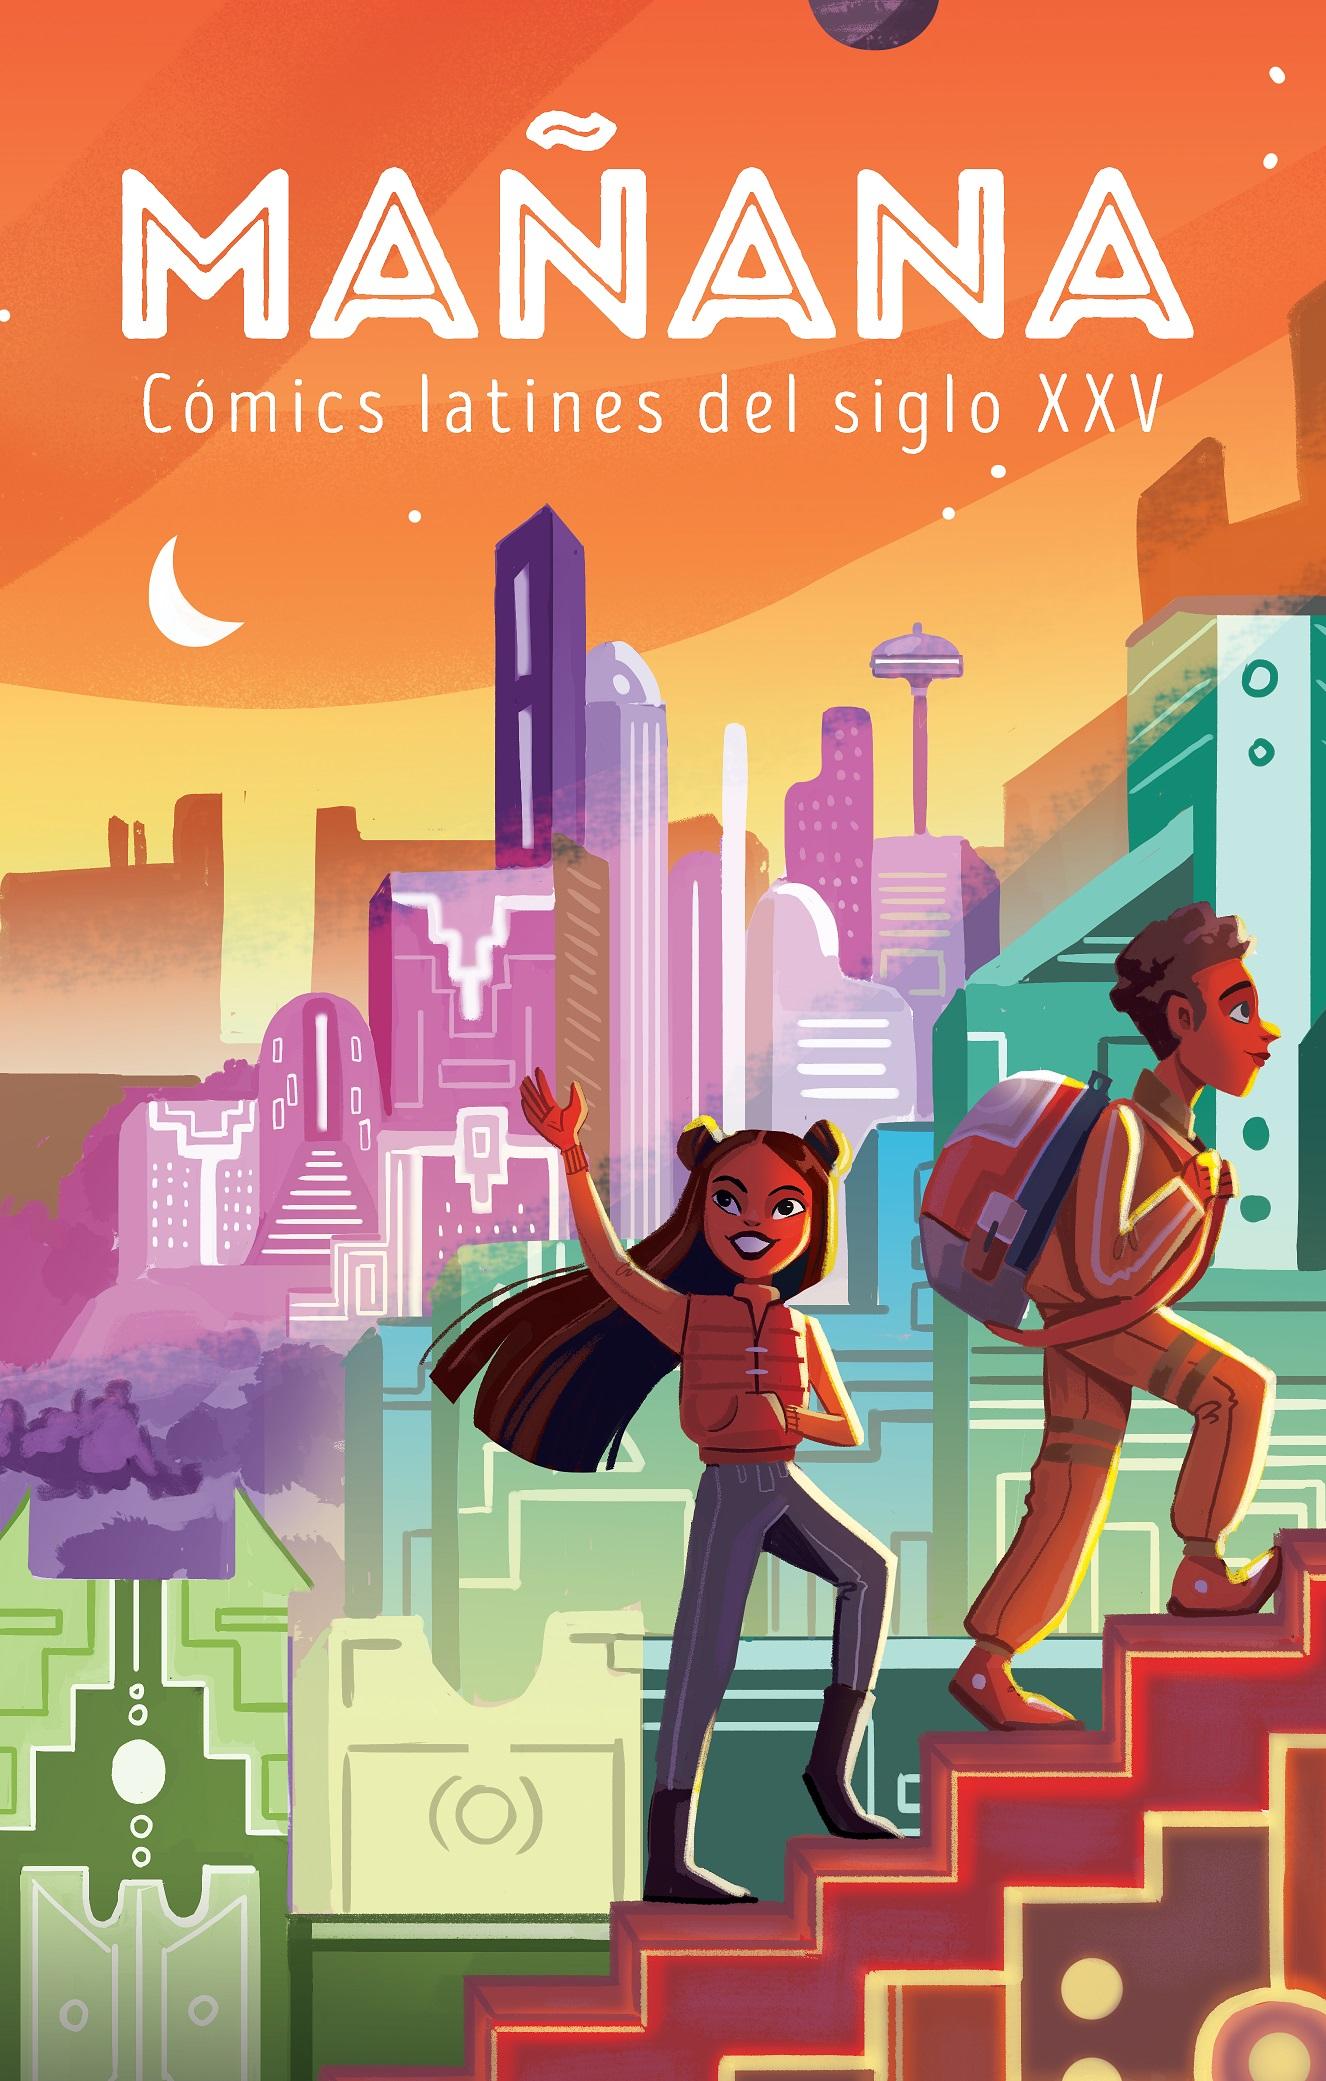 Mañana: Latinx Comics From the 25th Century edited by Joamette Gil